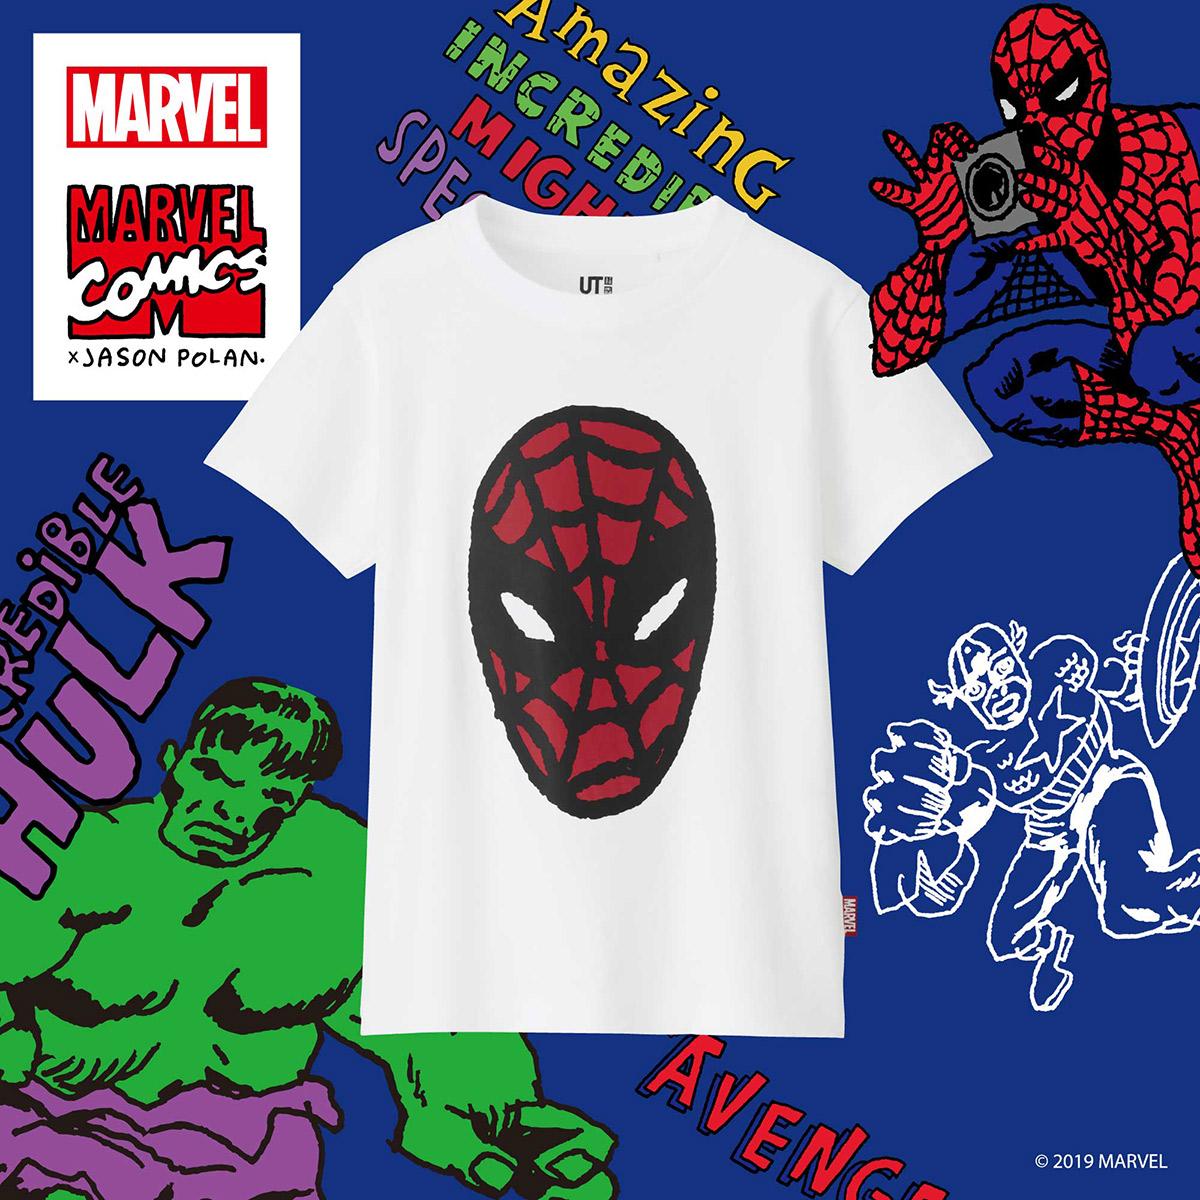 Marvel_JasonP_socialmedia_boys_s.jpg